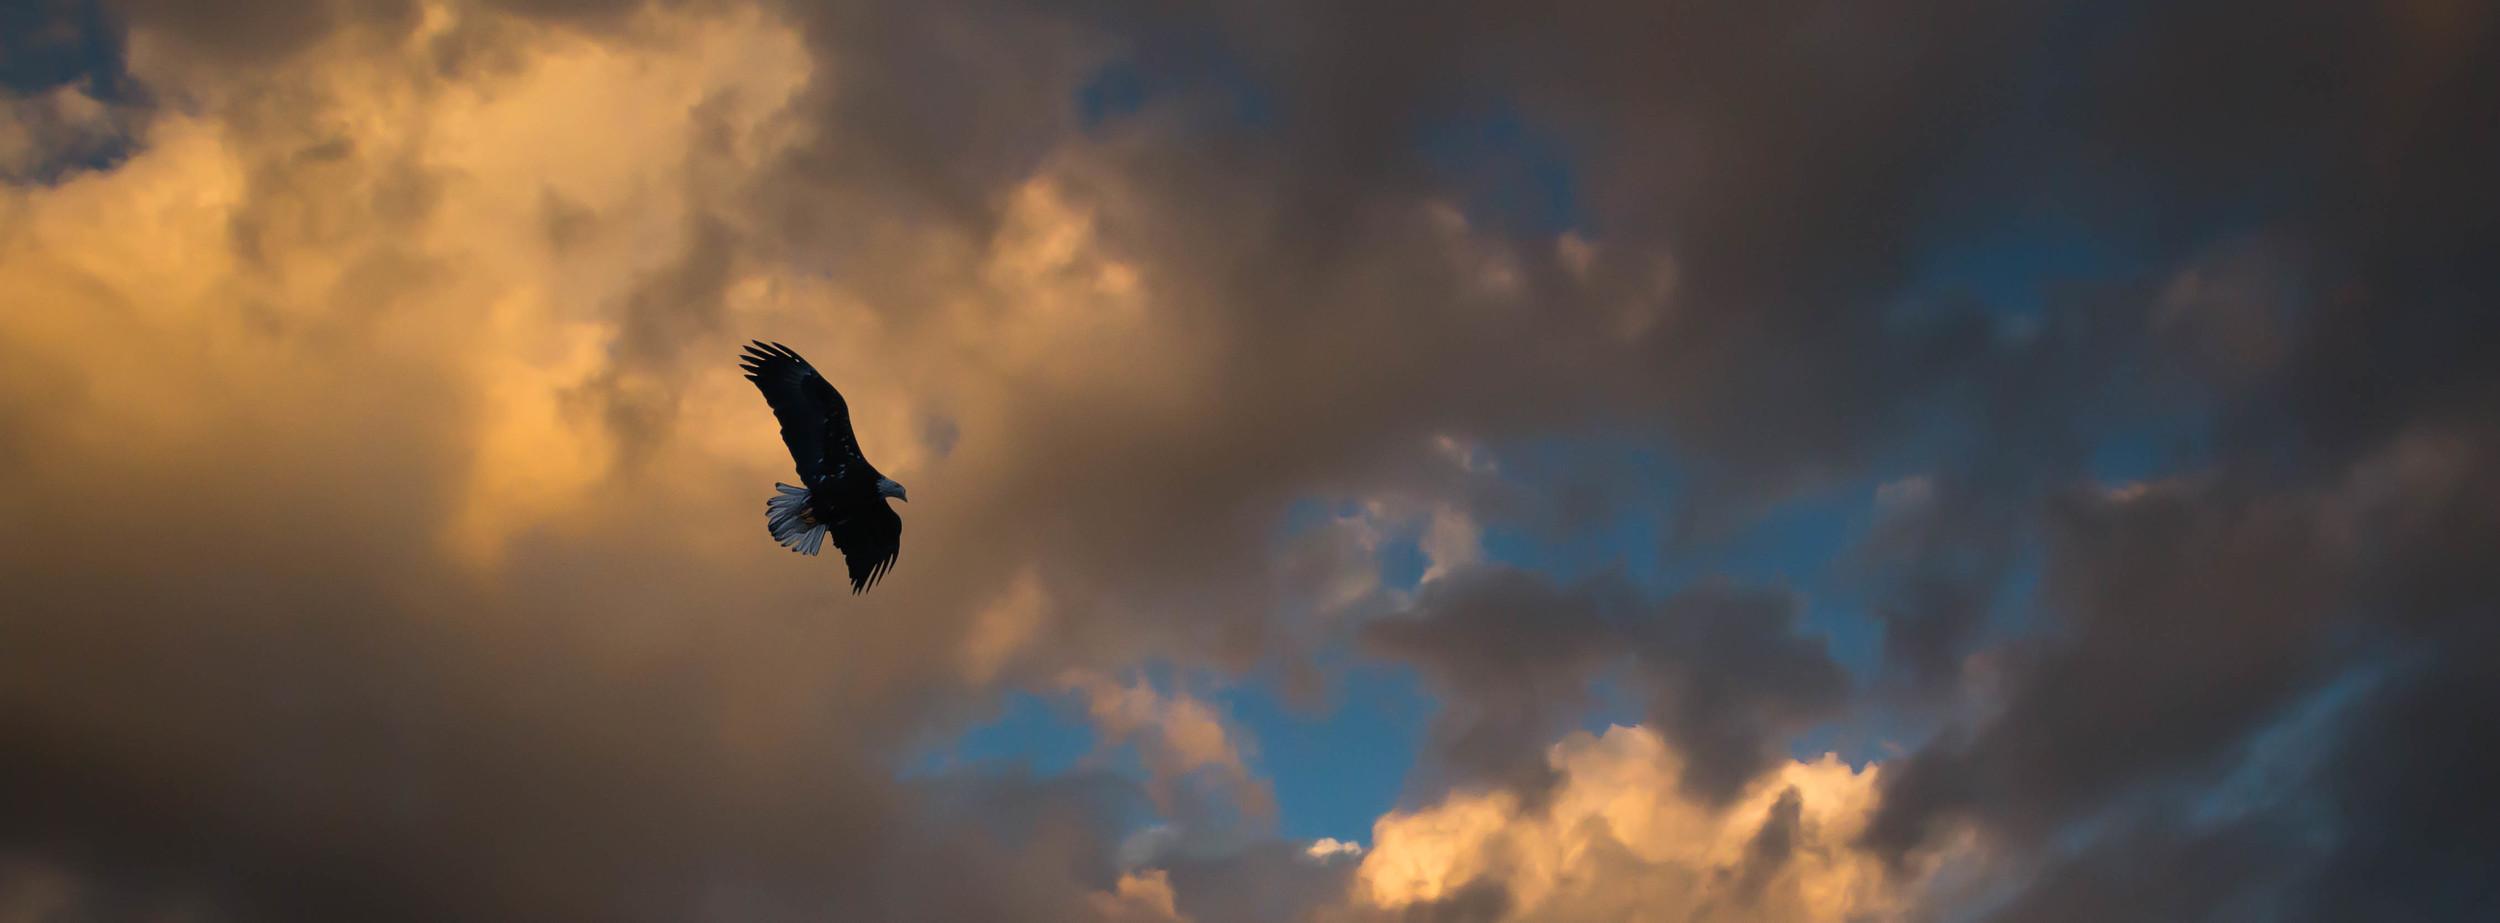 Eagle Over the Fox River